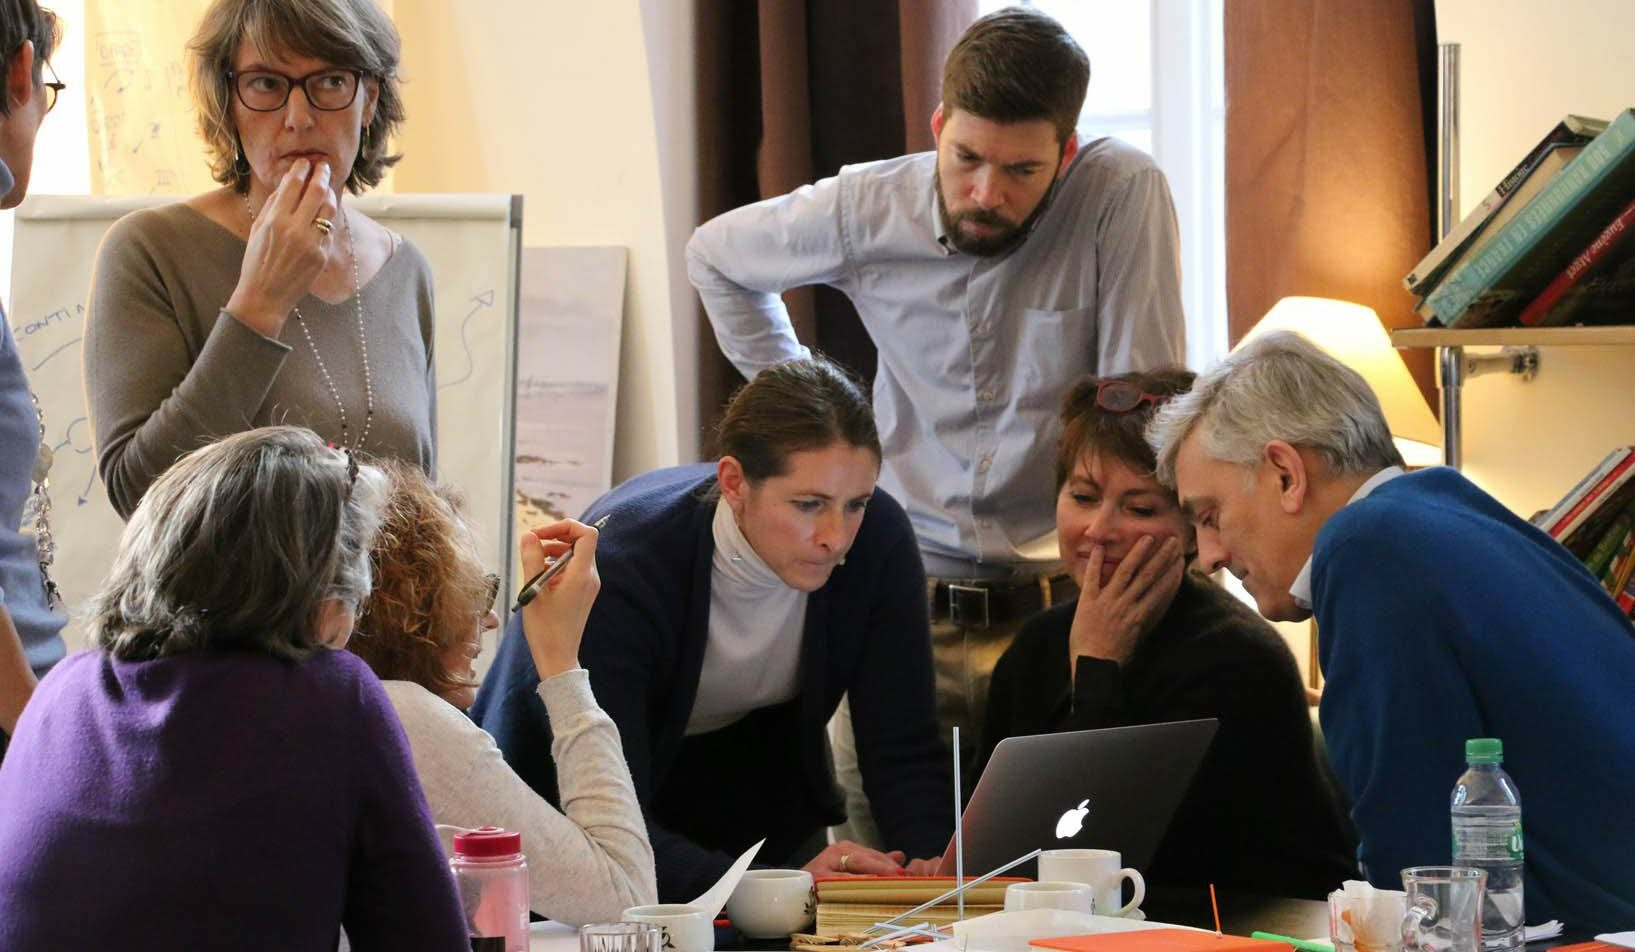 Hackathon: Future of Work